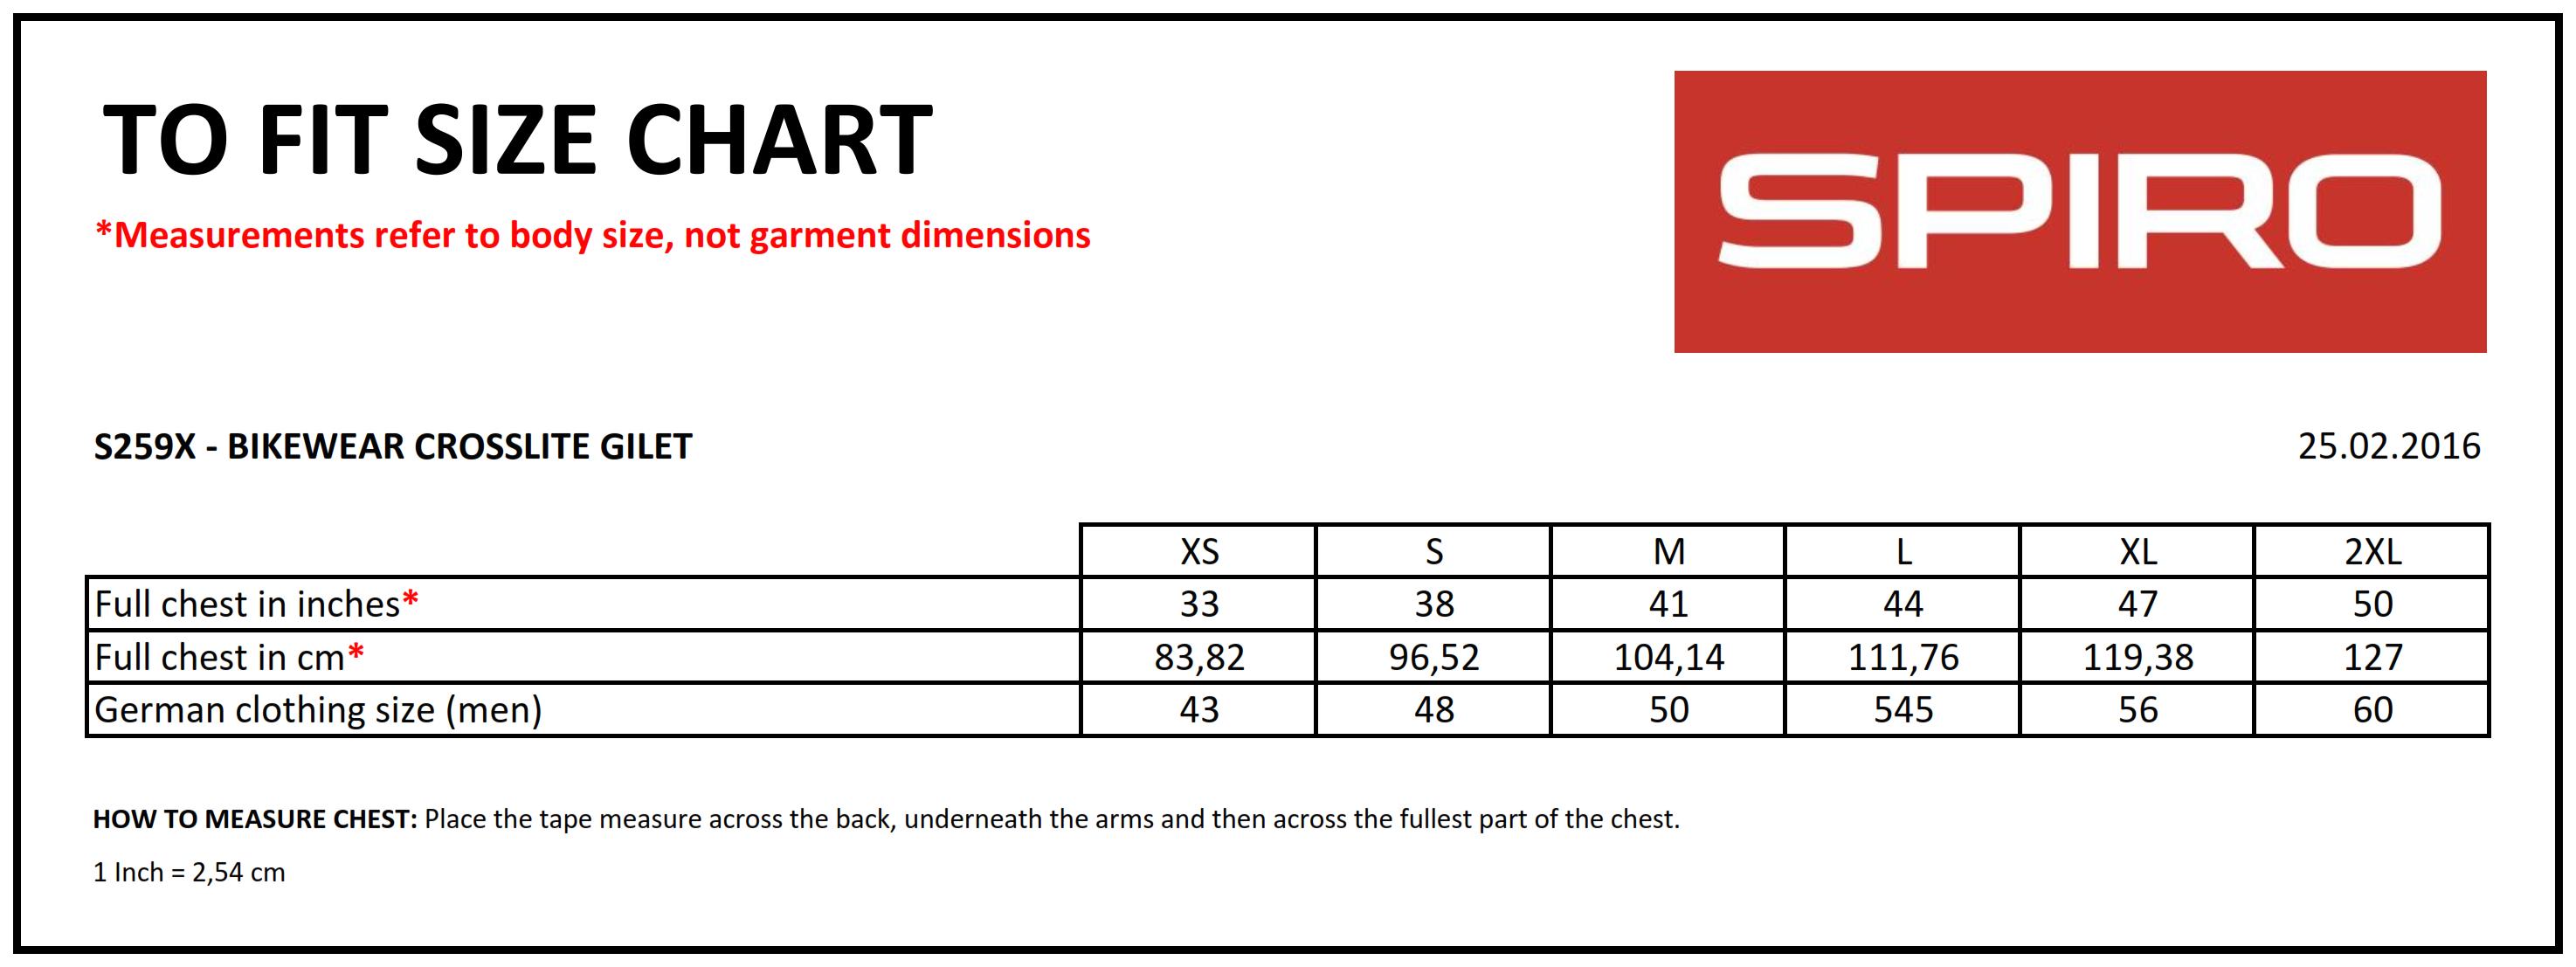 Result: Spiro Bikewear Crosslite Gilet S259X